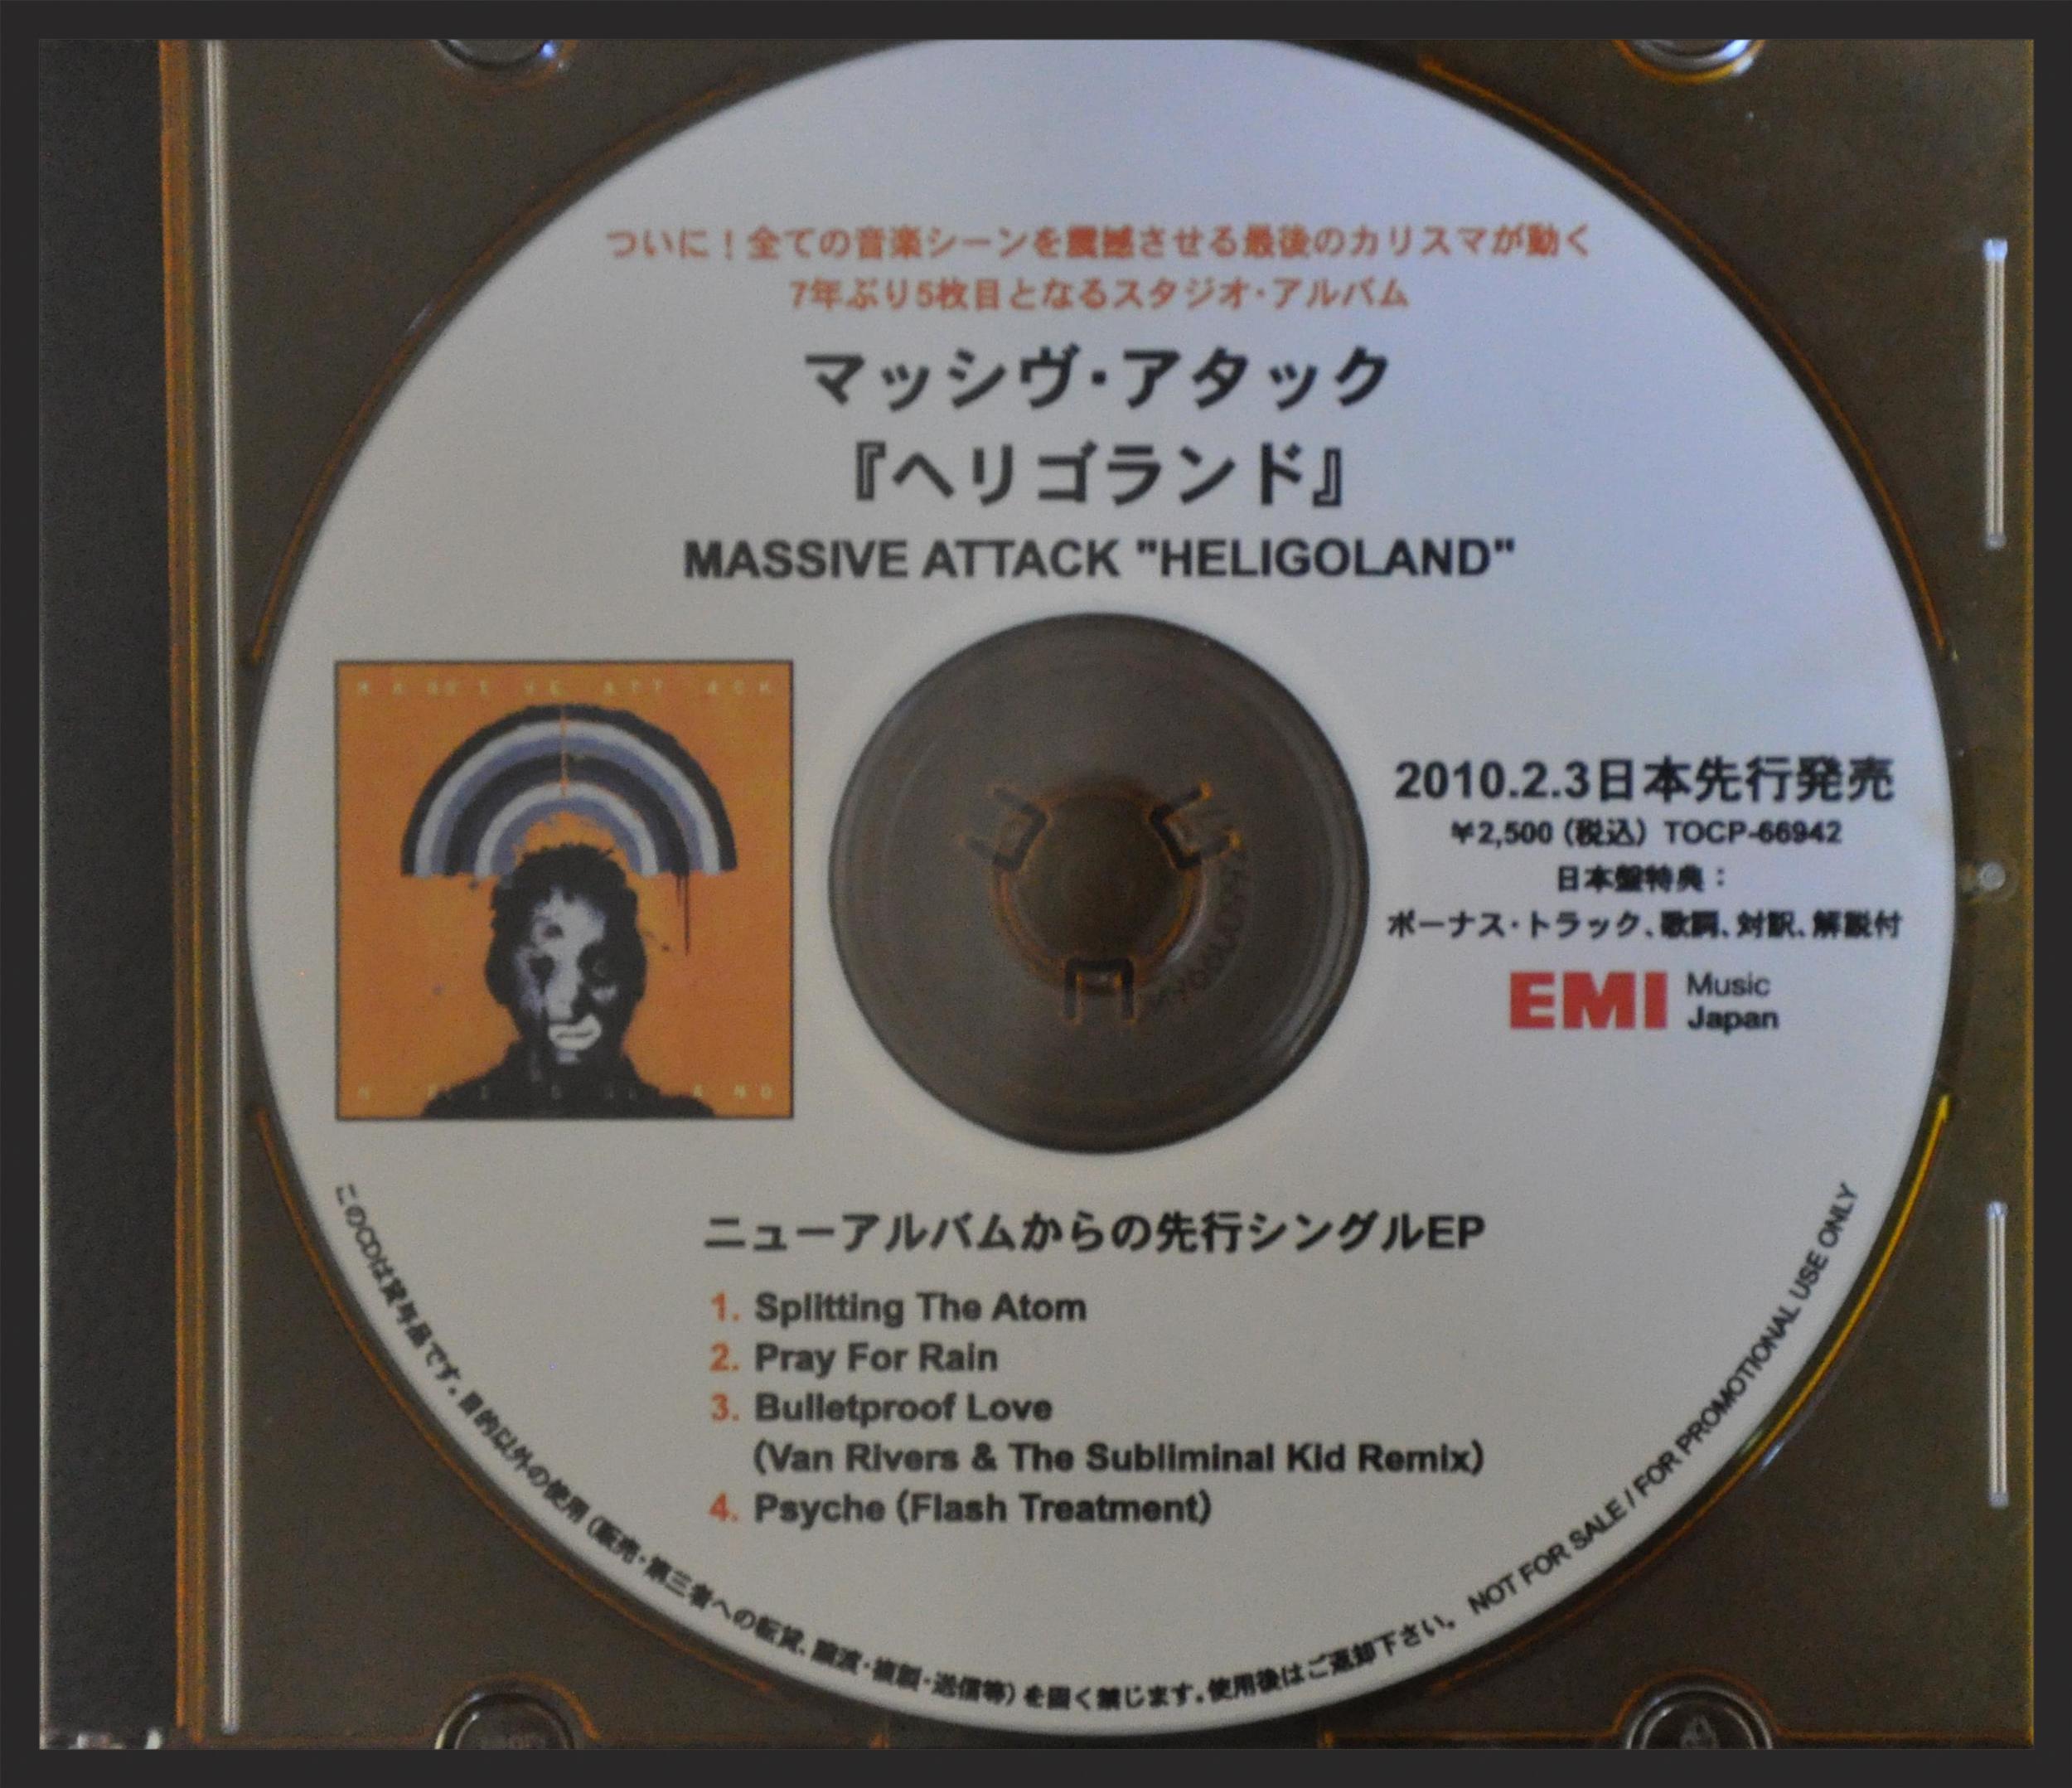 japanesepromocdr-1304337956.jpg